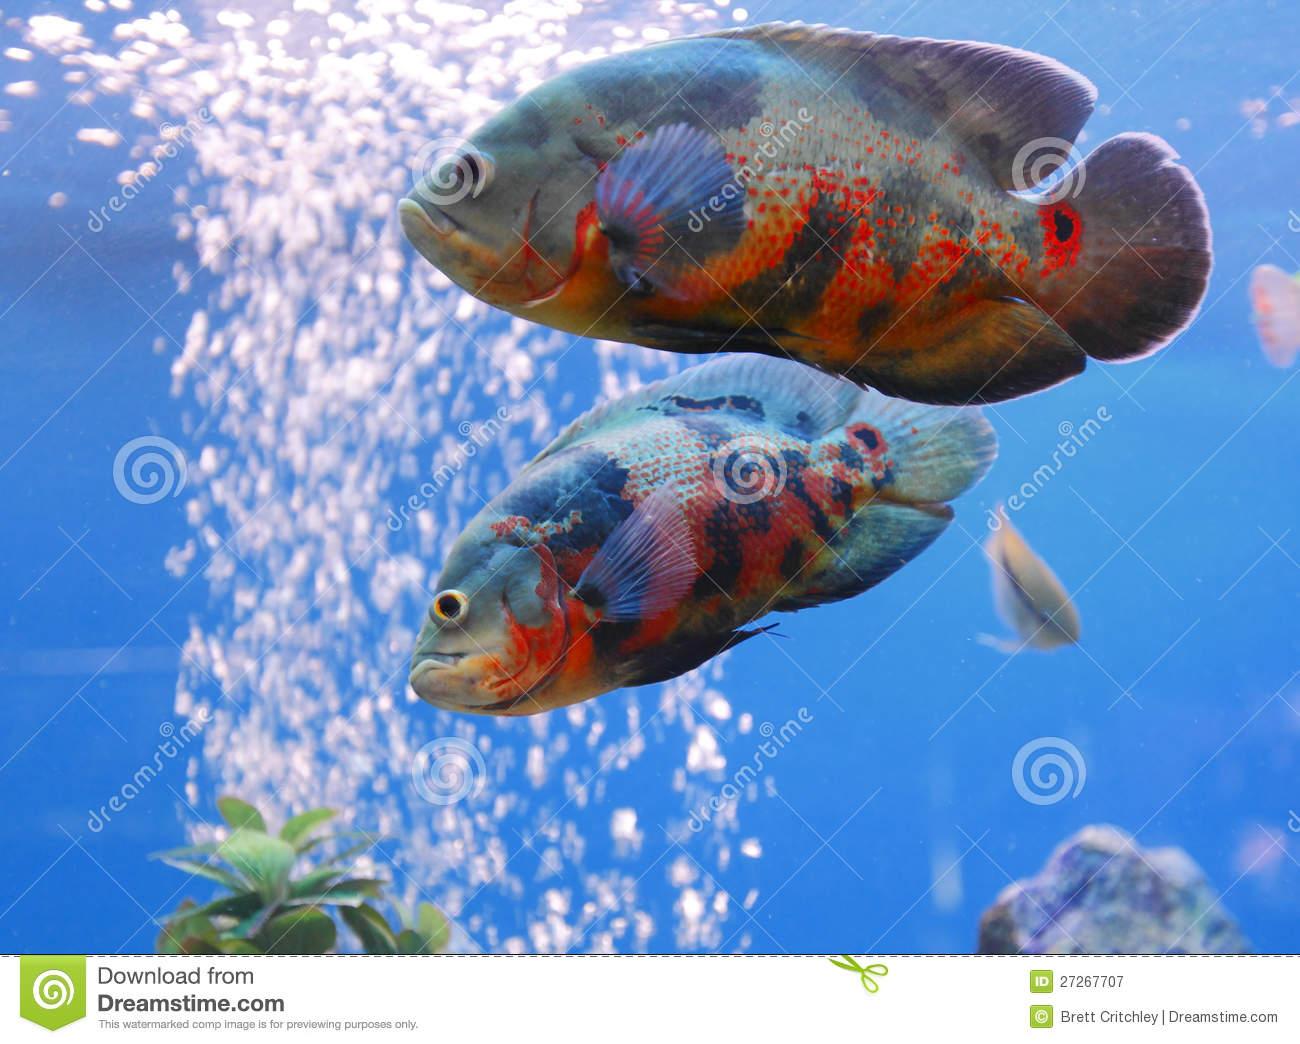 Oscar (Fish) clipart #15, Download drawings